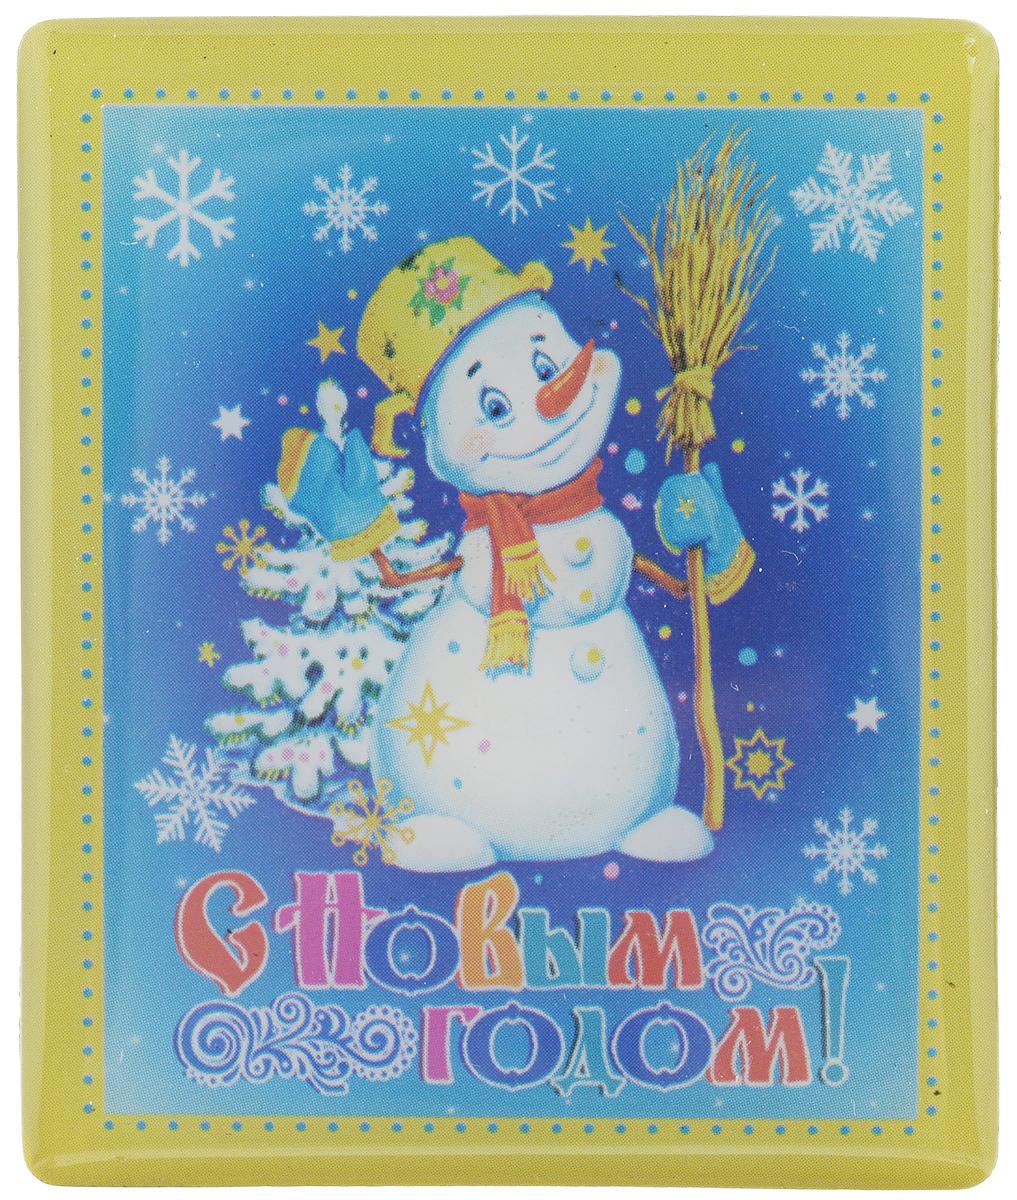 Магнит Феникс-Презент Снеговик, 5 x 6 см миниатюра снеговик цвет серебристый 6 5 см